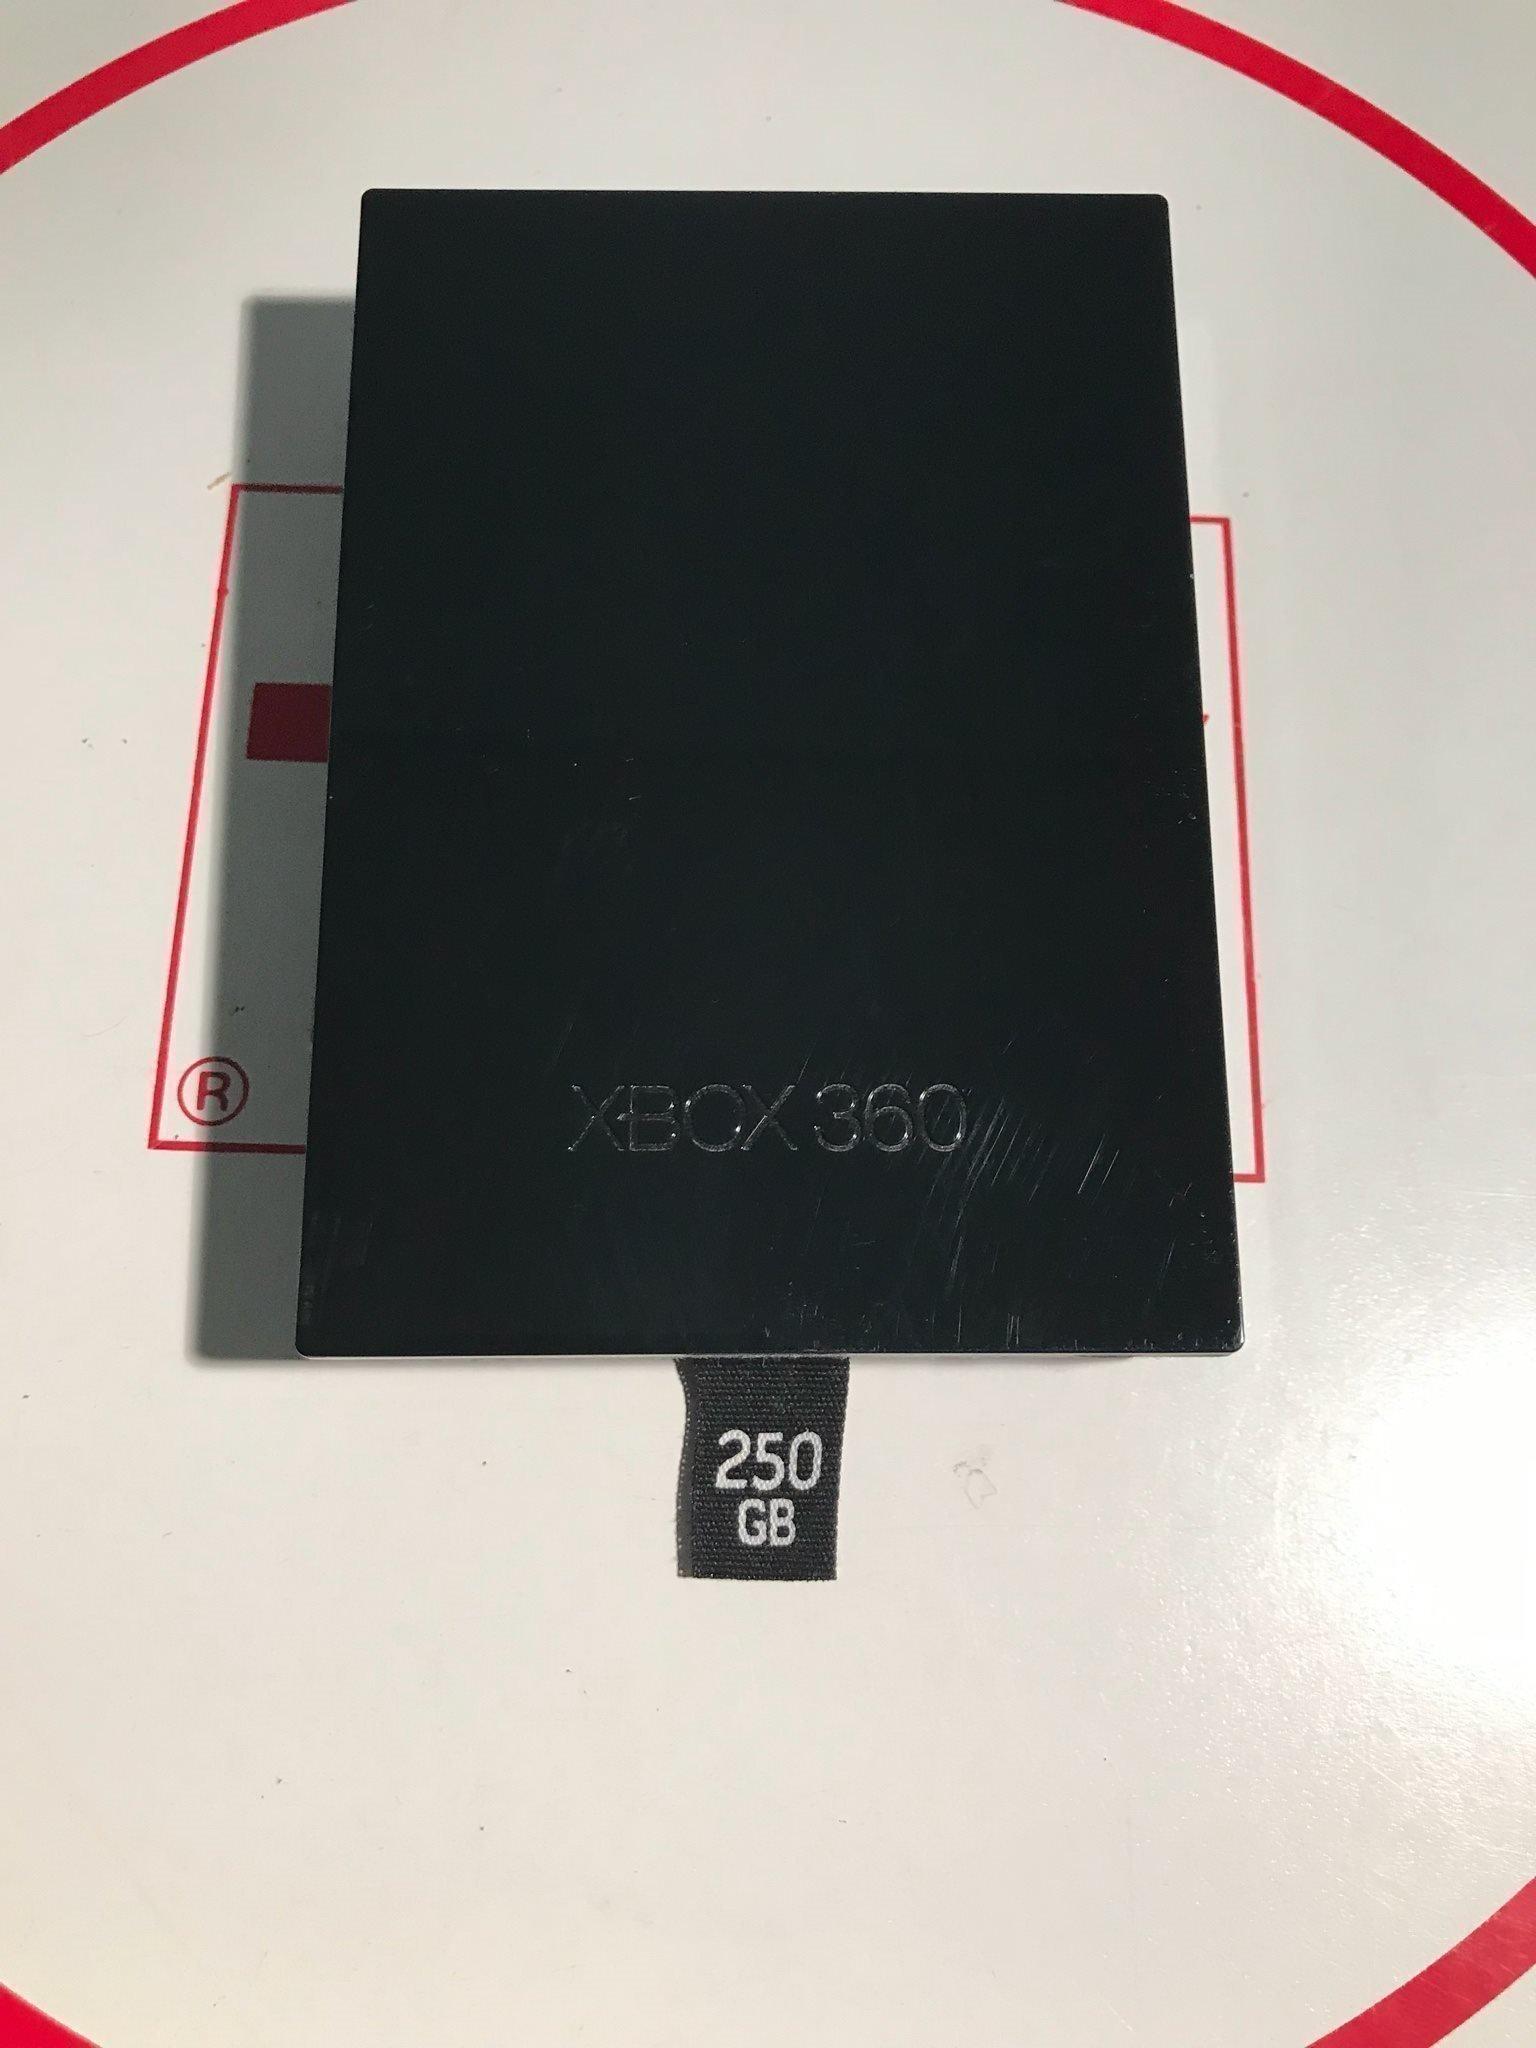 250 Gb Harddisk Hdd Xbox 360 Slim Elite Origi 376967738 ᐈ